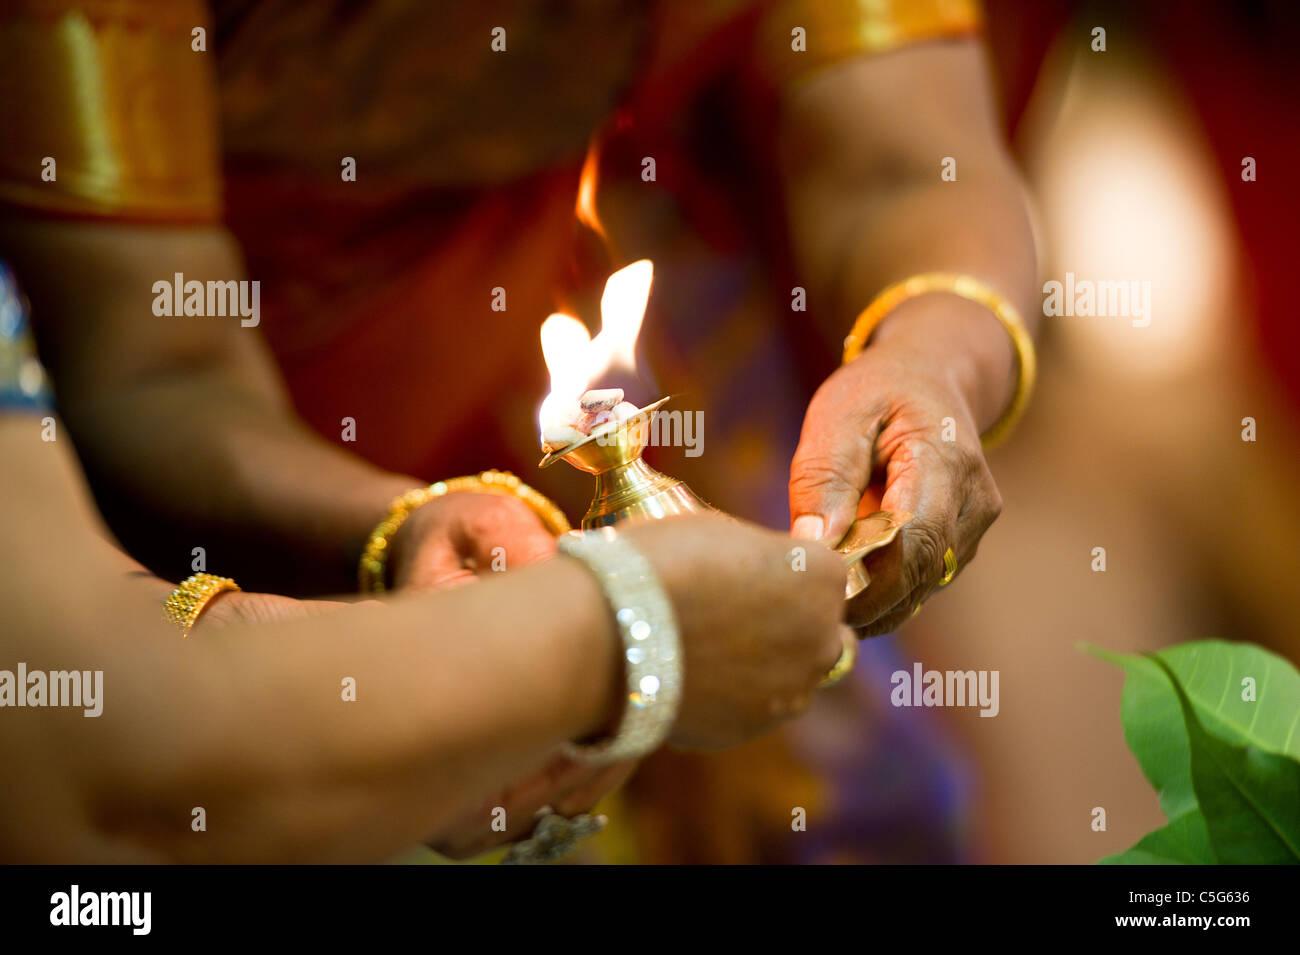 Indiano indù cerimonia di matrimonio in un tempio Immagini Stock